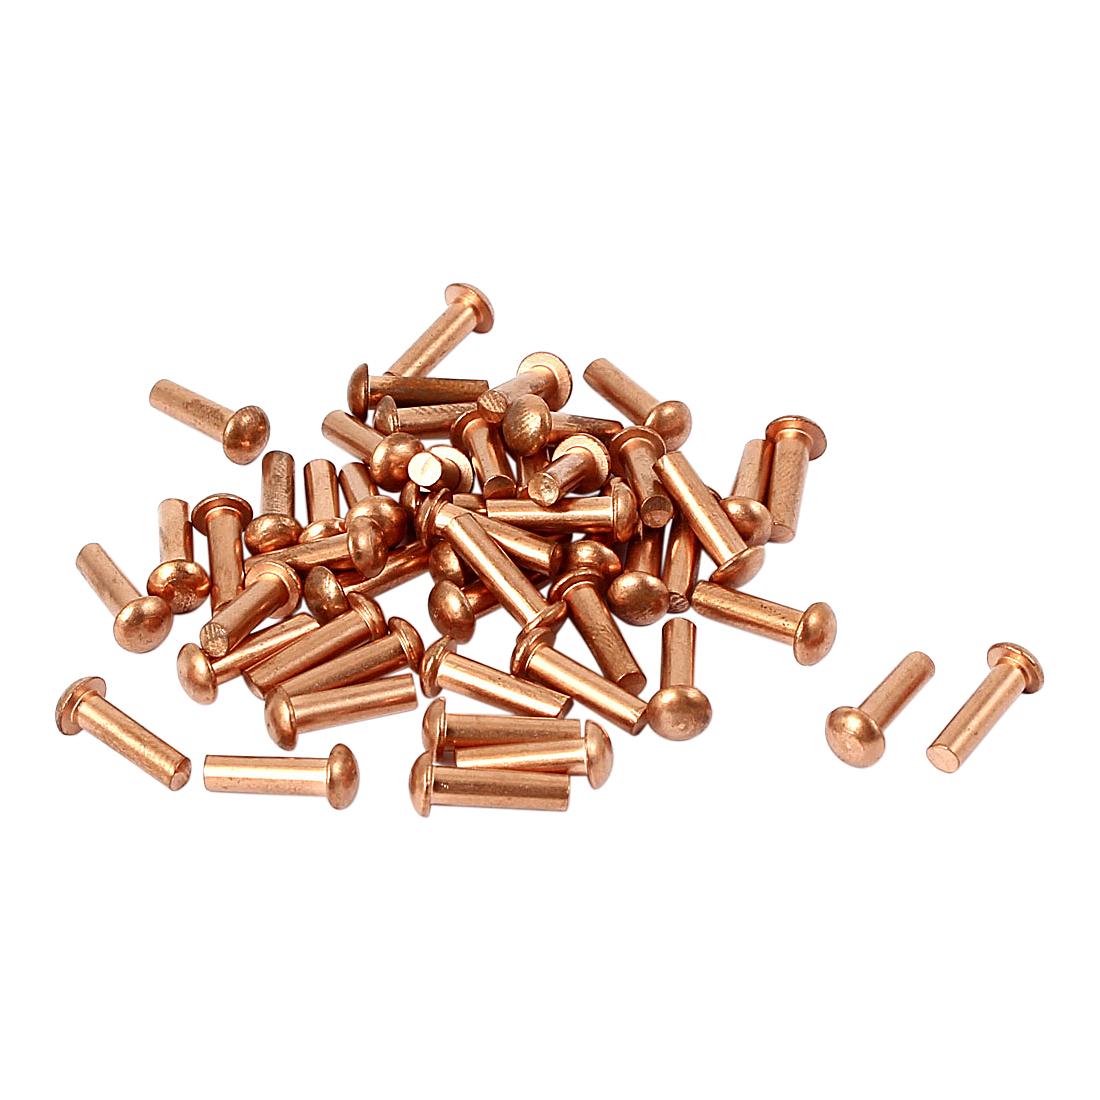 3mm x 10mm Shaft Flat Head Bolts Copper Solid Rivets Fasteners Gold Tone 50 Pcs